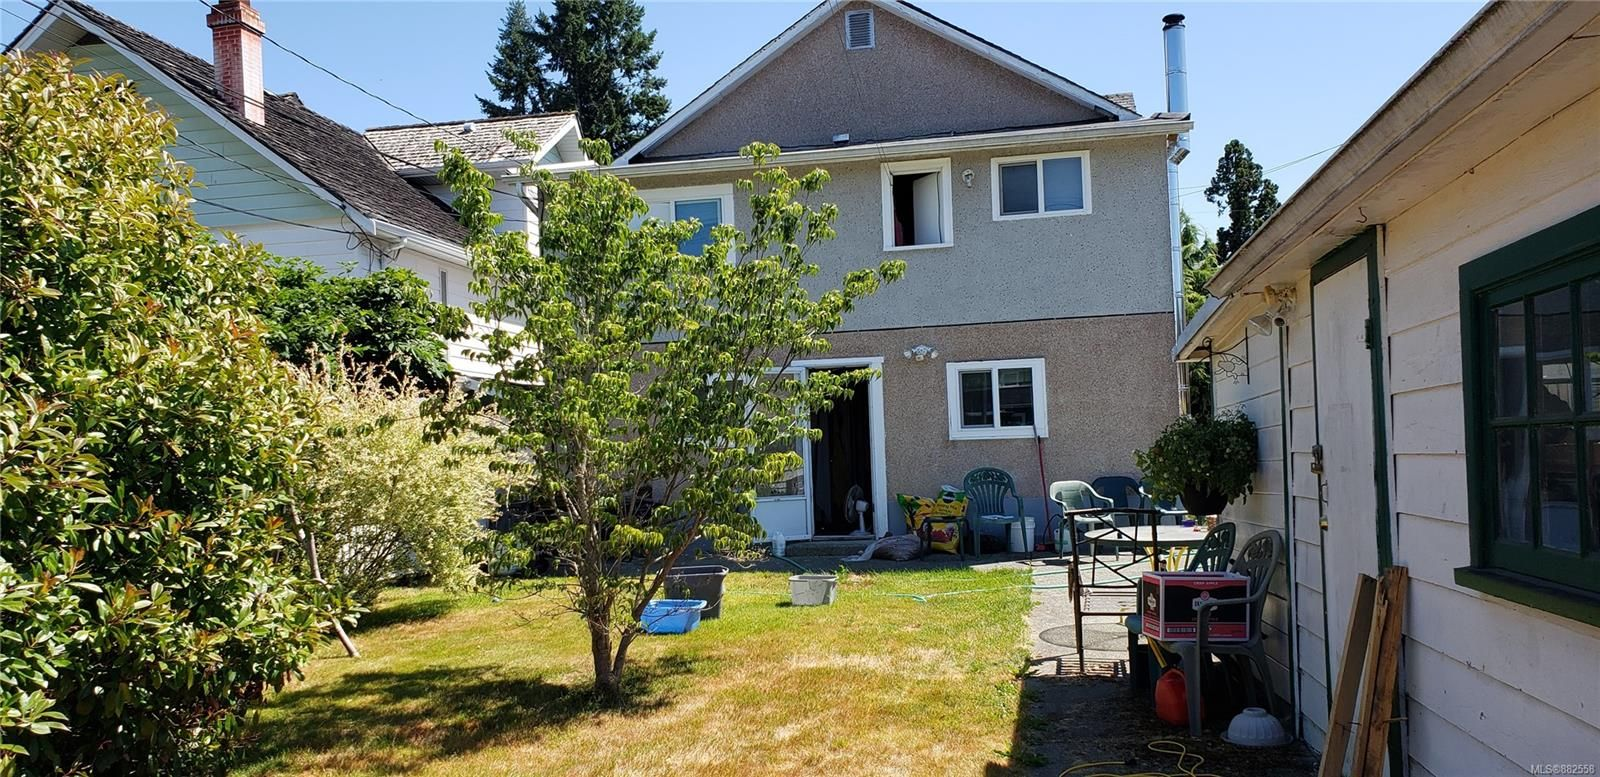 Photo 2: Photos: 2686 6th Ave in : PA Port Alberni House for sale (Port Alberni)  : MLS®# 882558